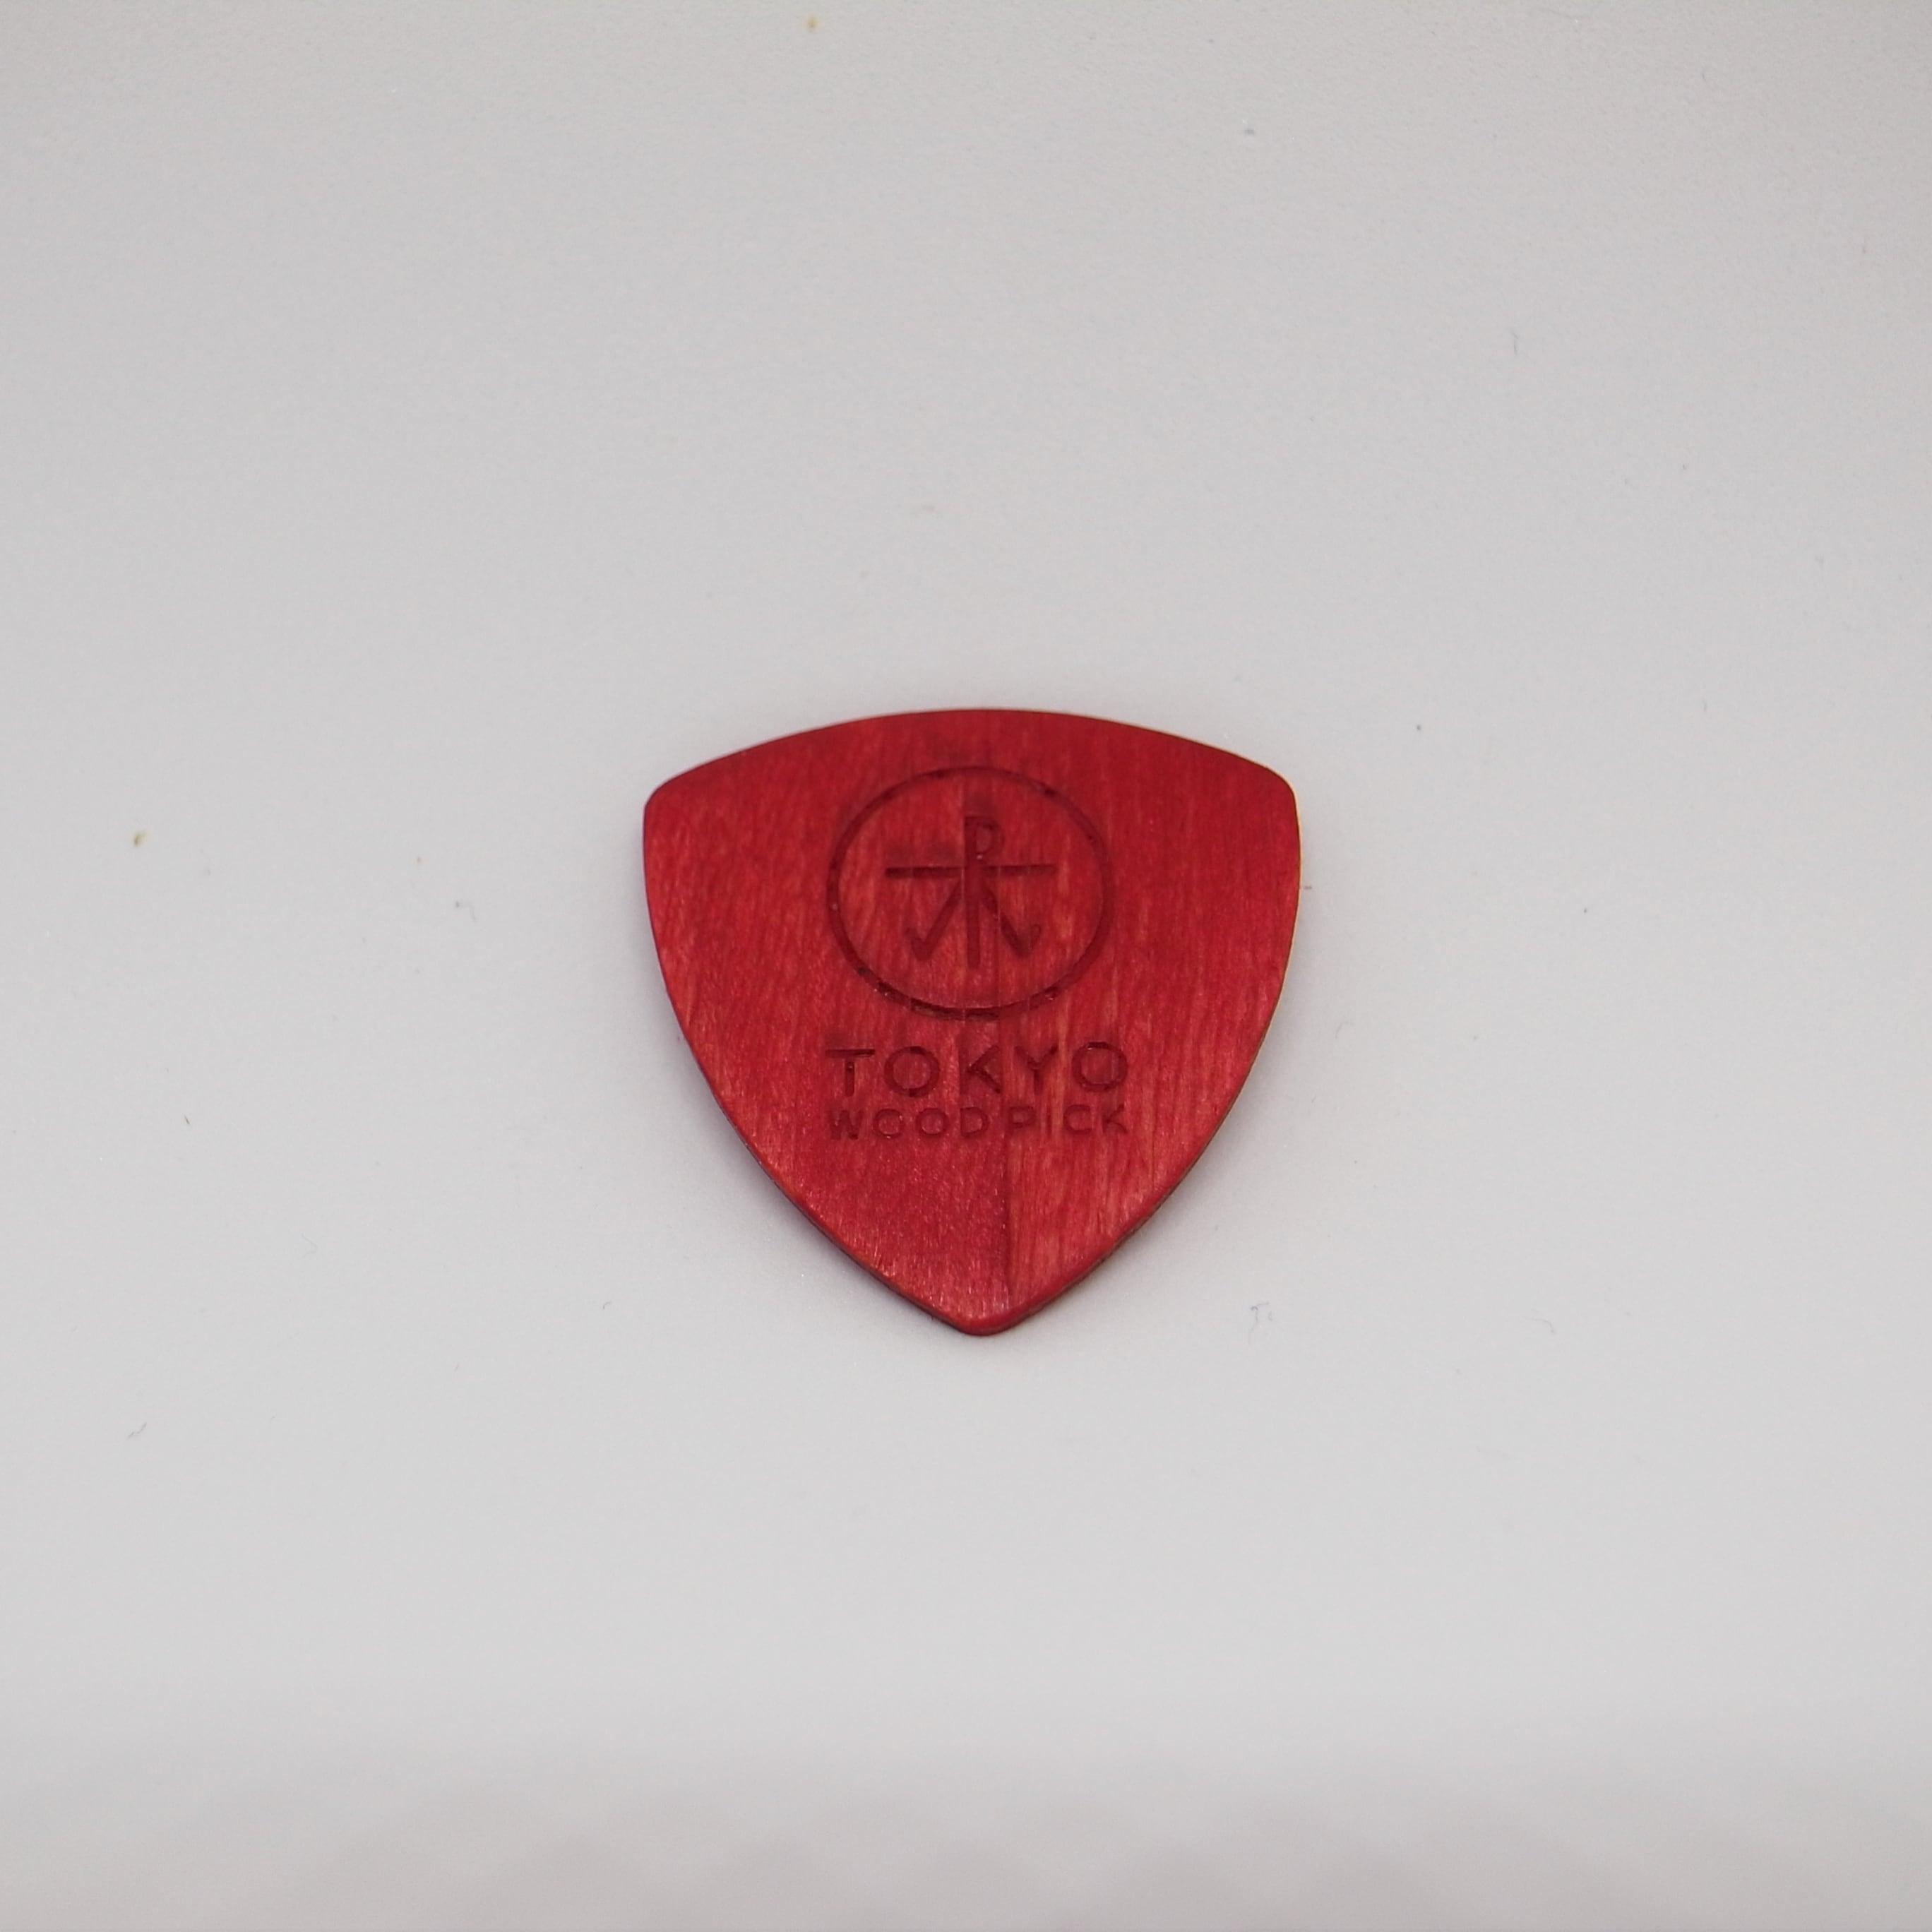 Triangle型   ギターピック TOKYO WOOD PICK Red